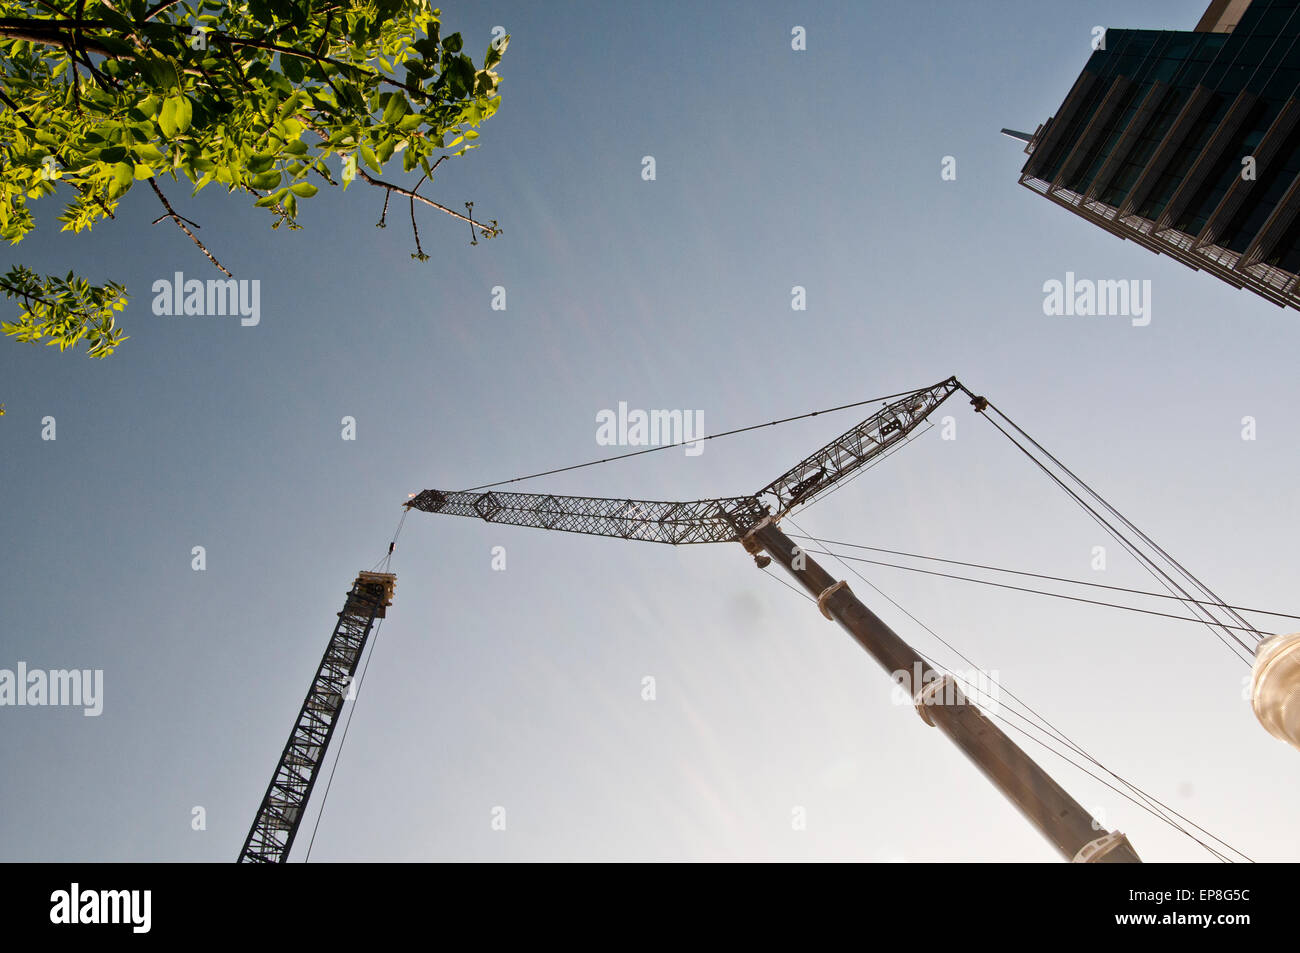 Boise Crane Rental